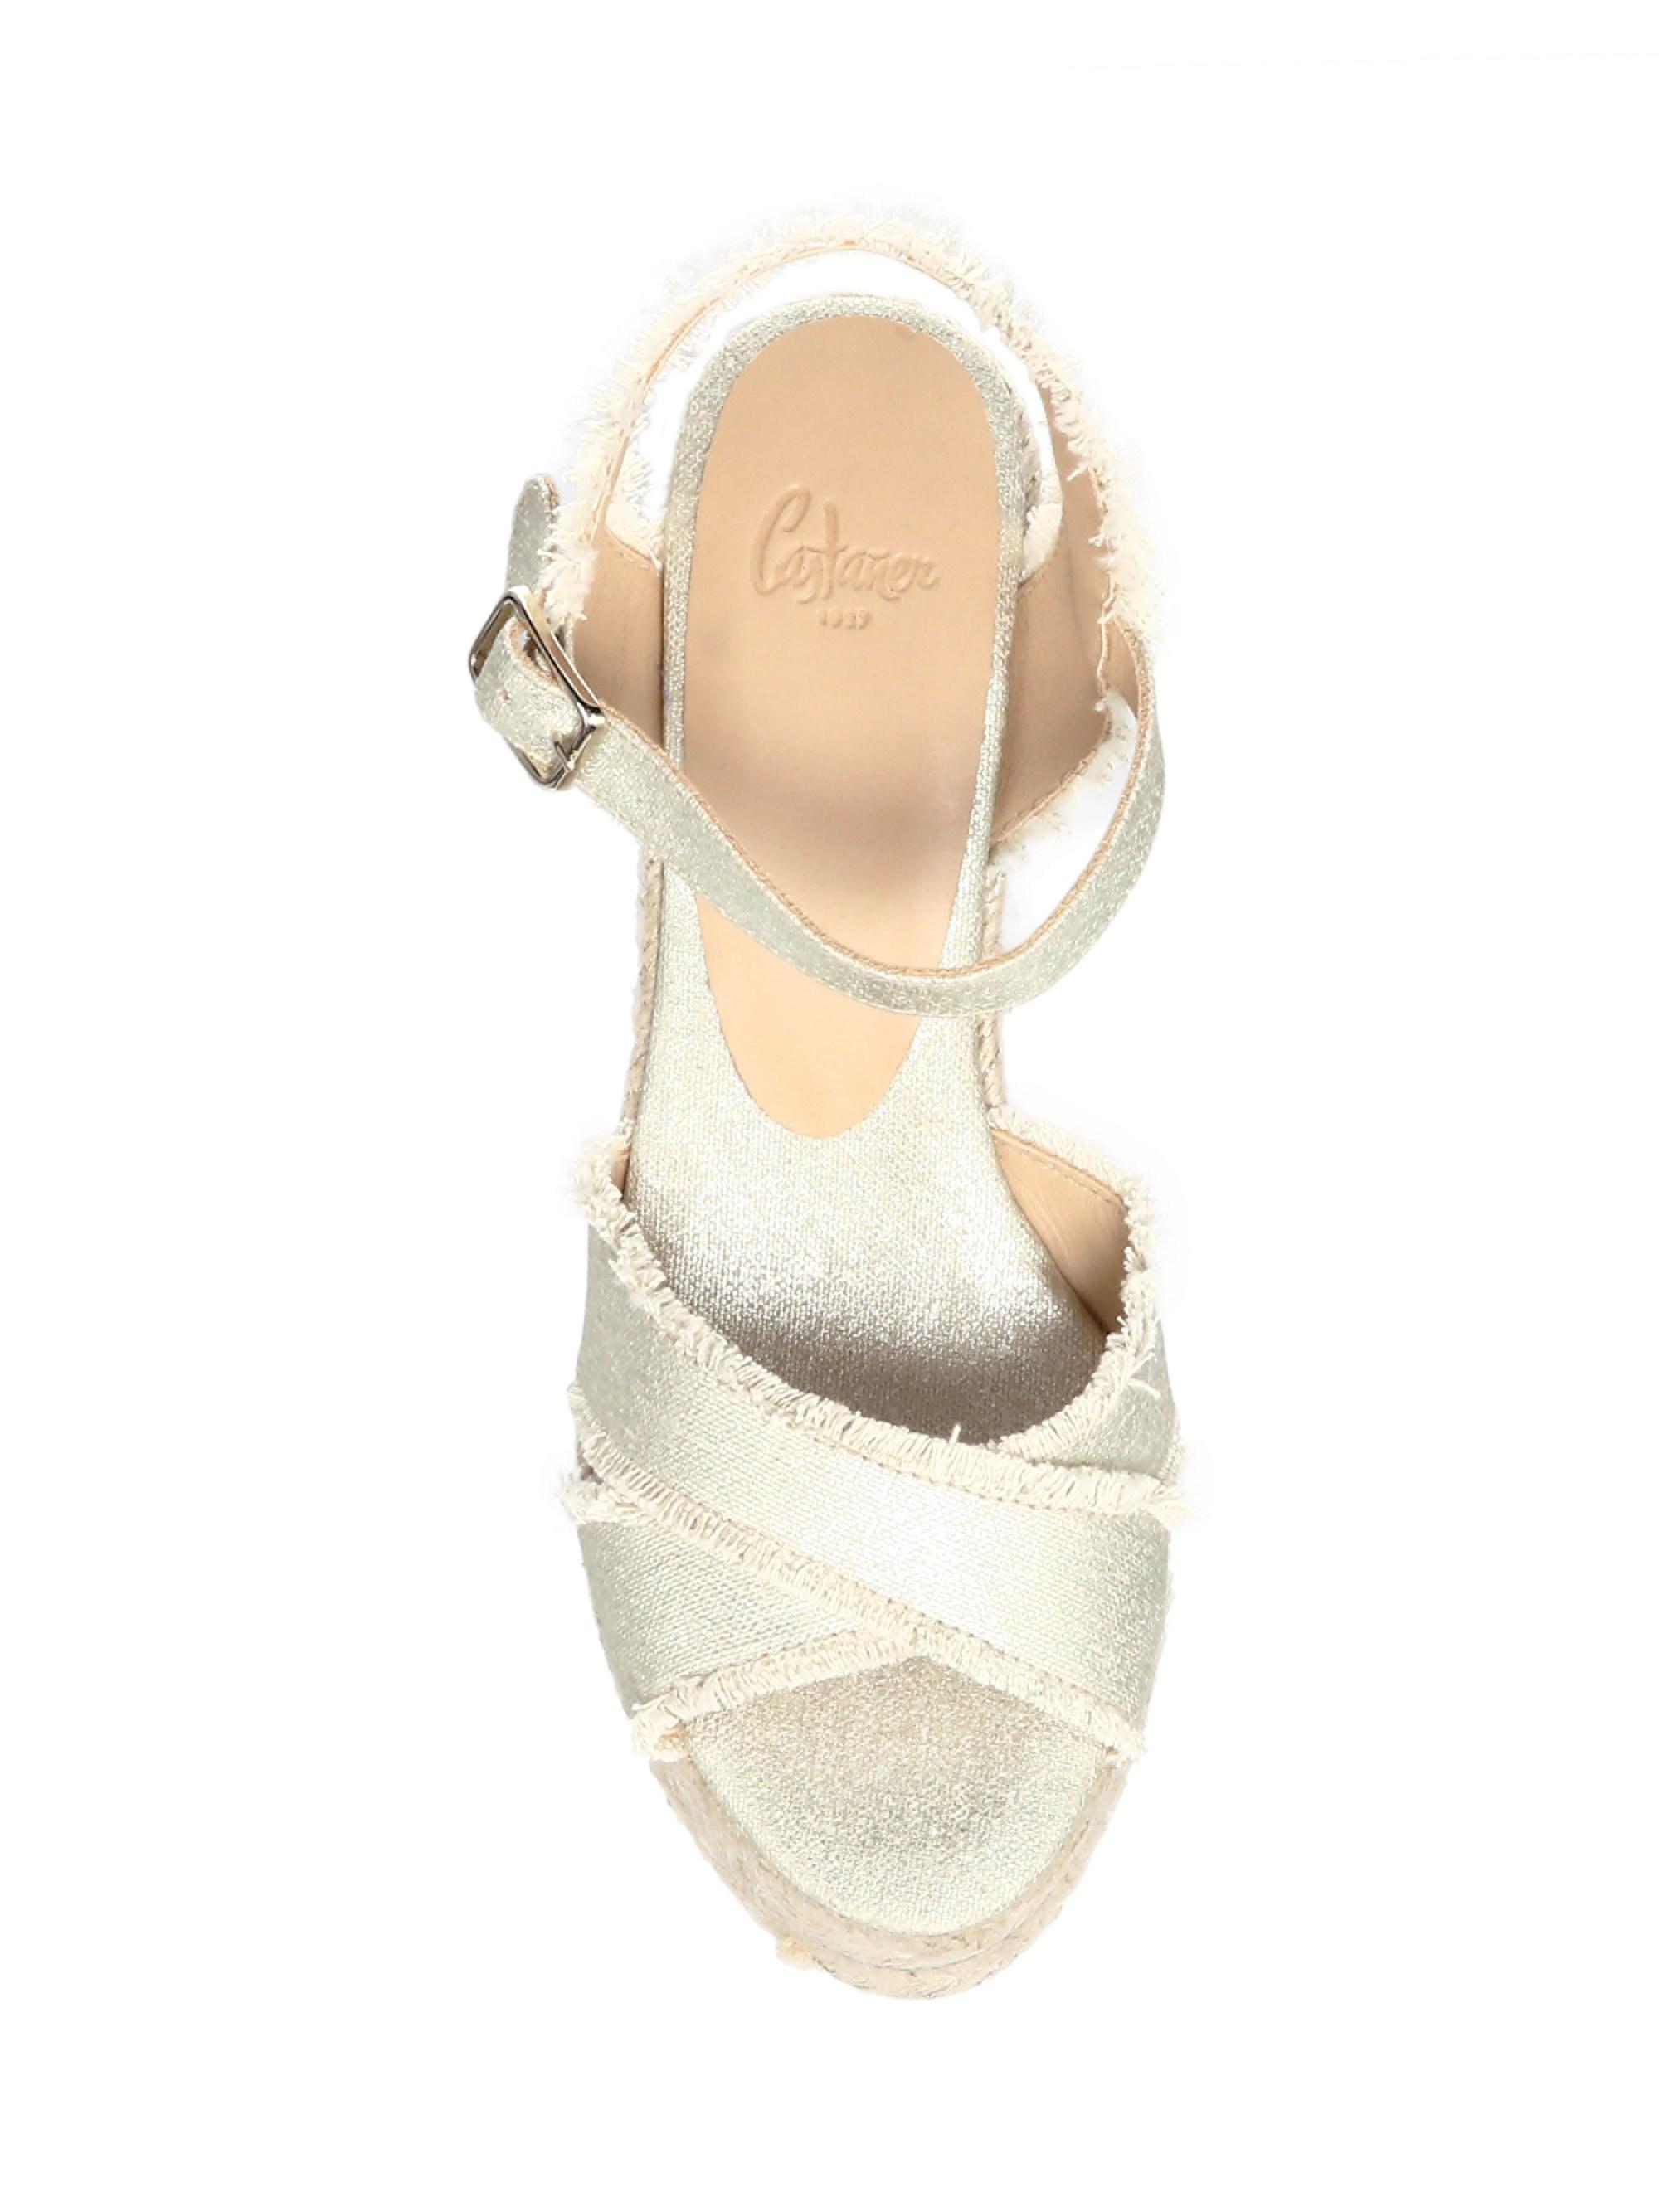 78ea0b712 Lyst - Castaner Women's Bromelia Metallic Wedge Leather Sandals ...